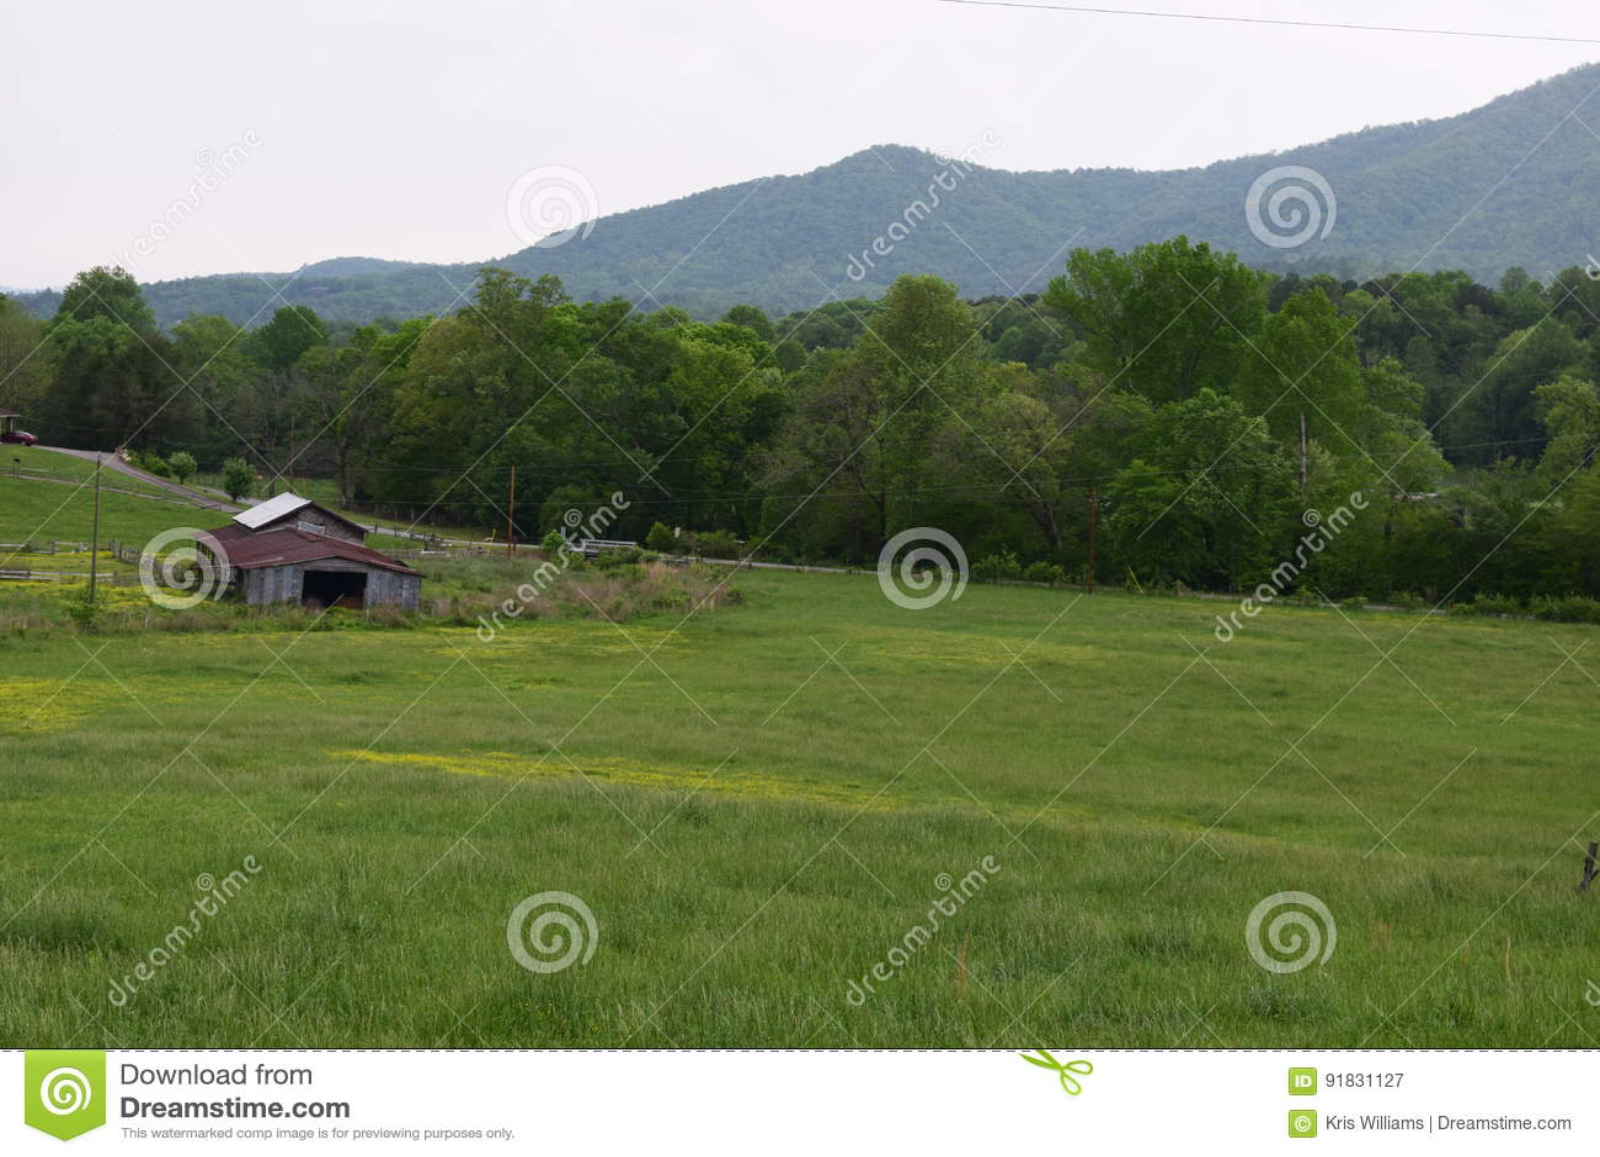 Western NC rural country mountain farm fields